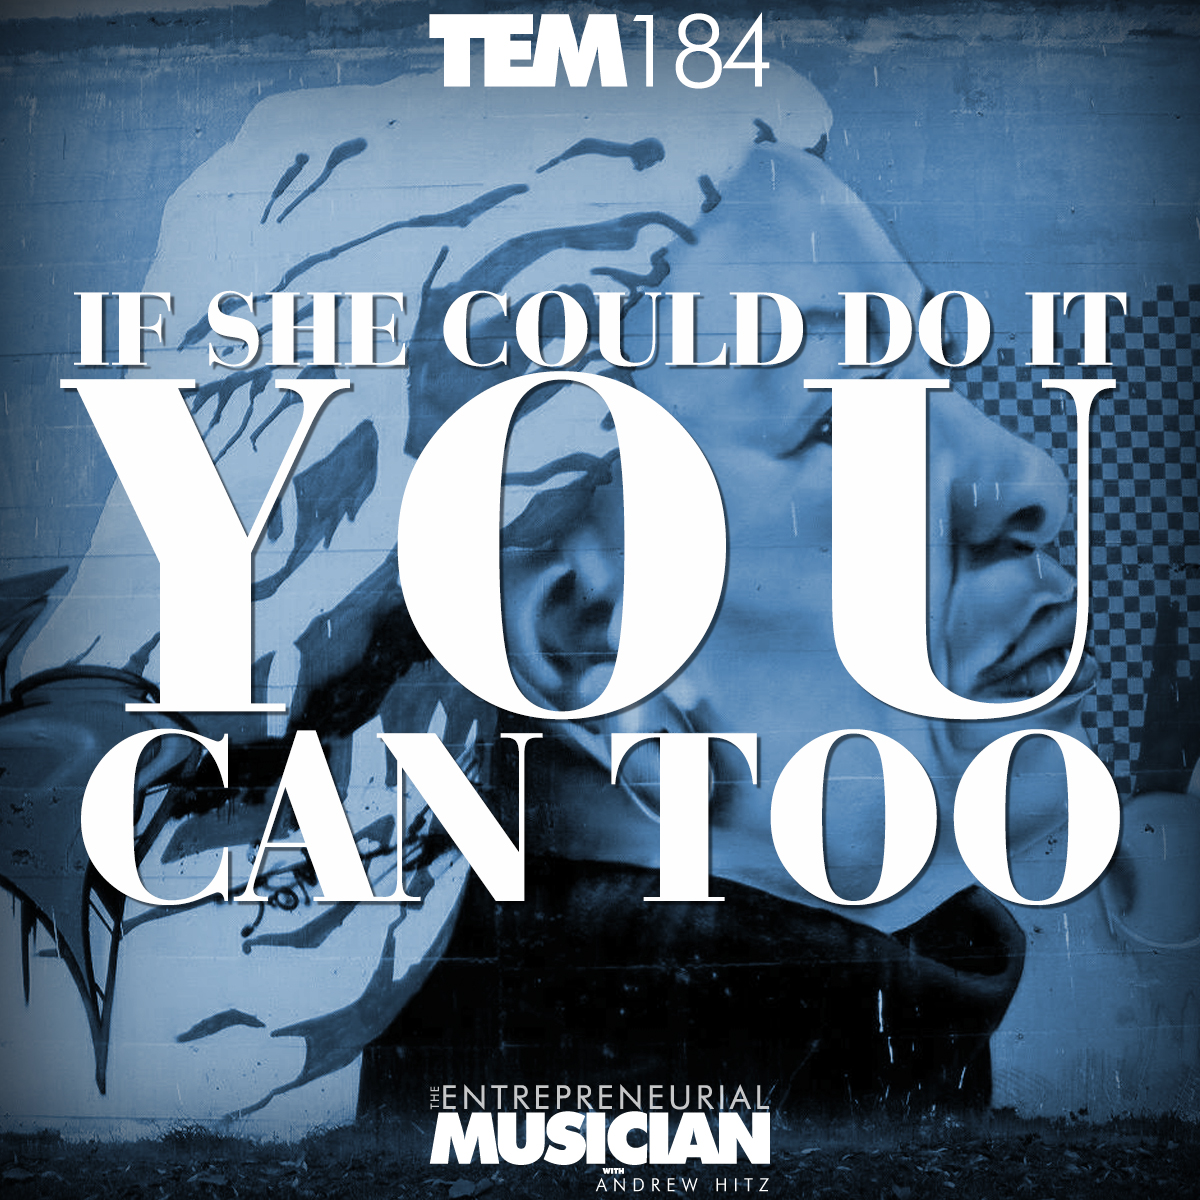 TEM184-Promo.jpg